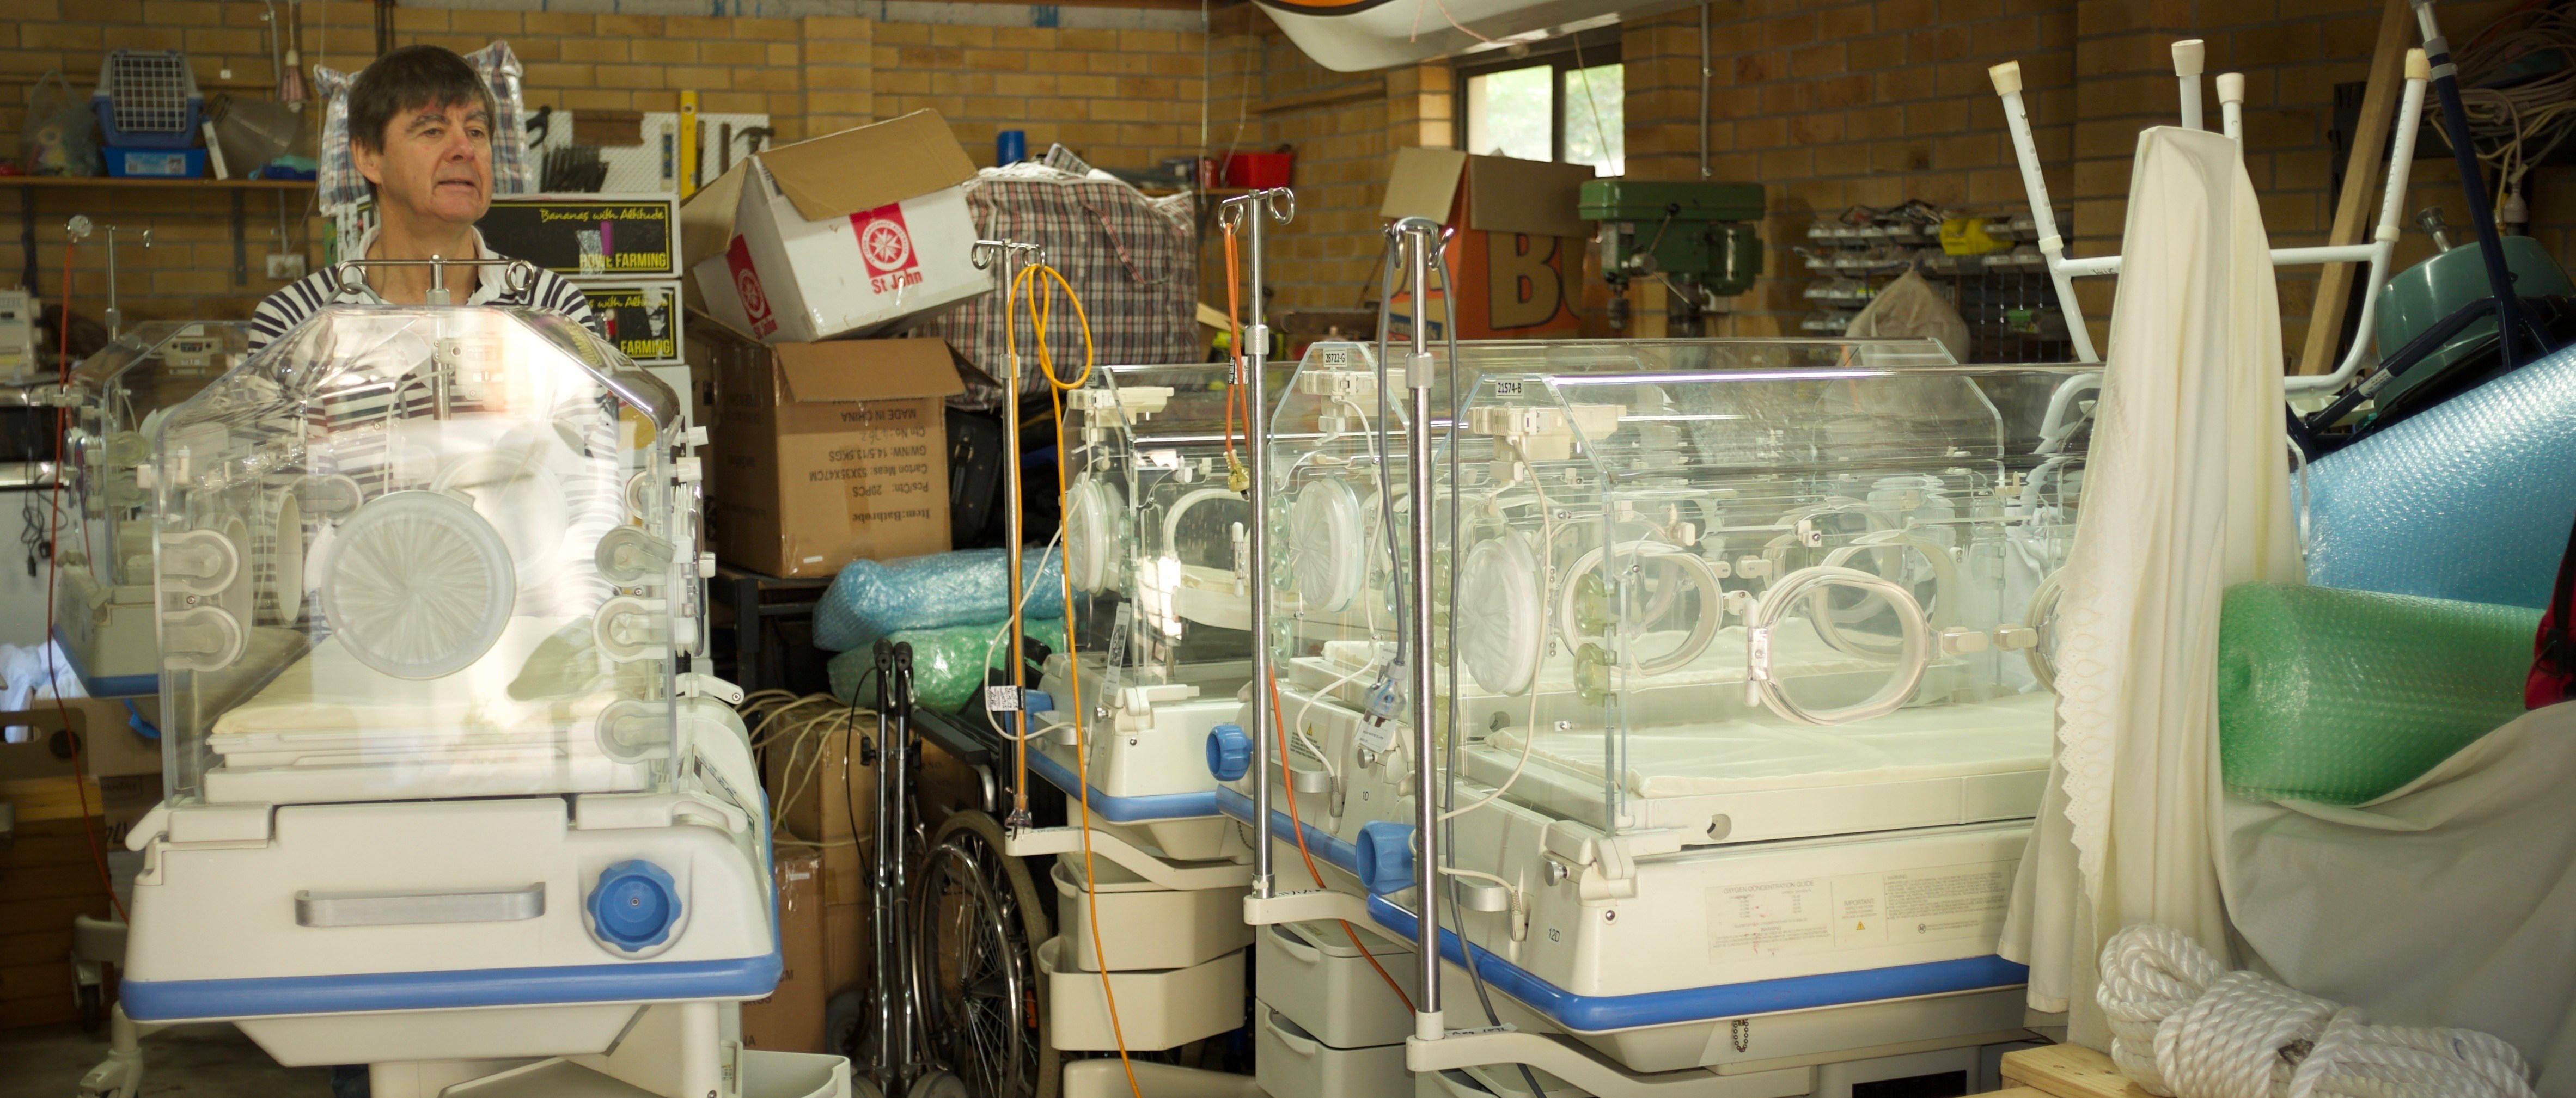 Hospital Equipment for Iraq